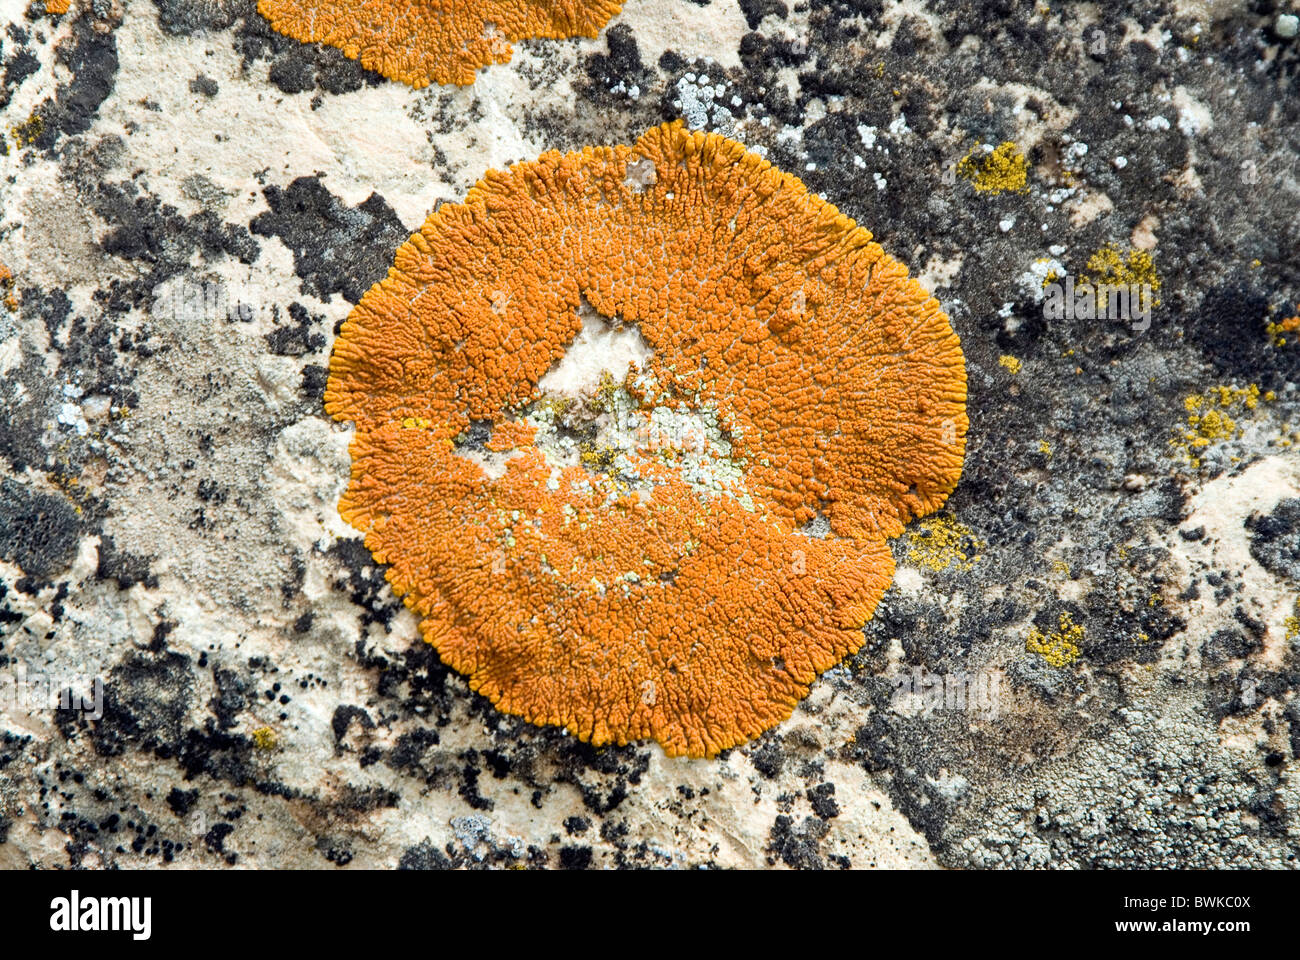 lichen lichens stone cliff pattern sample draft plan - Stock Image